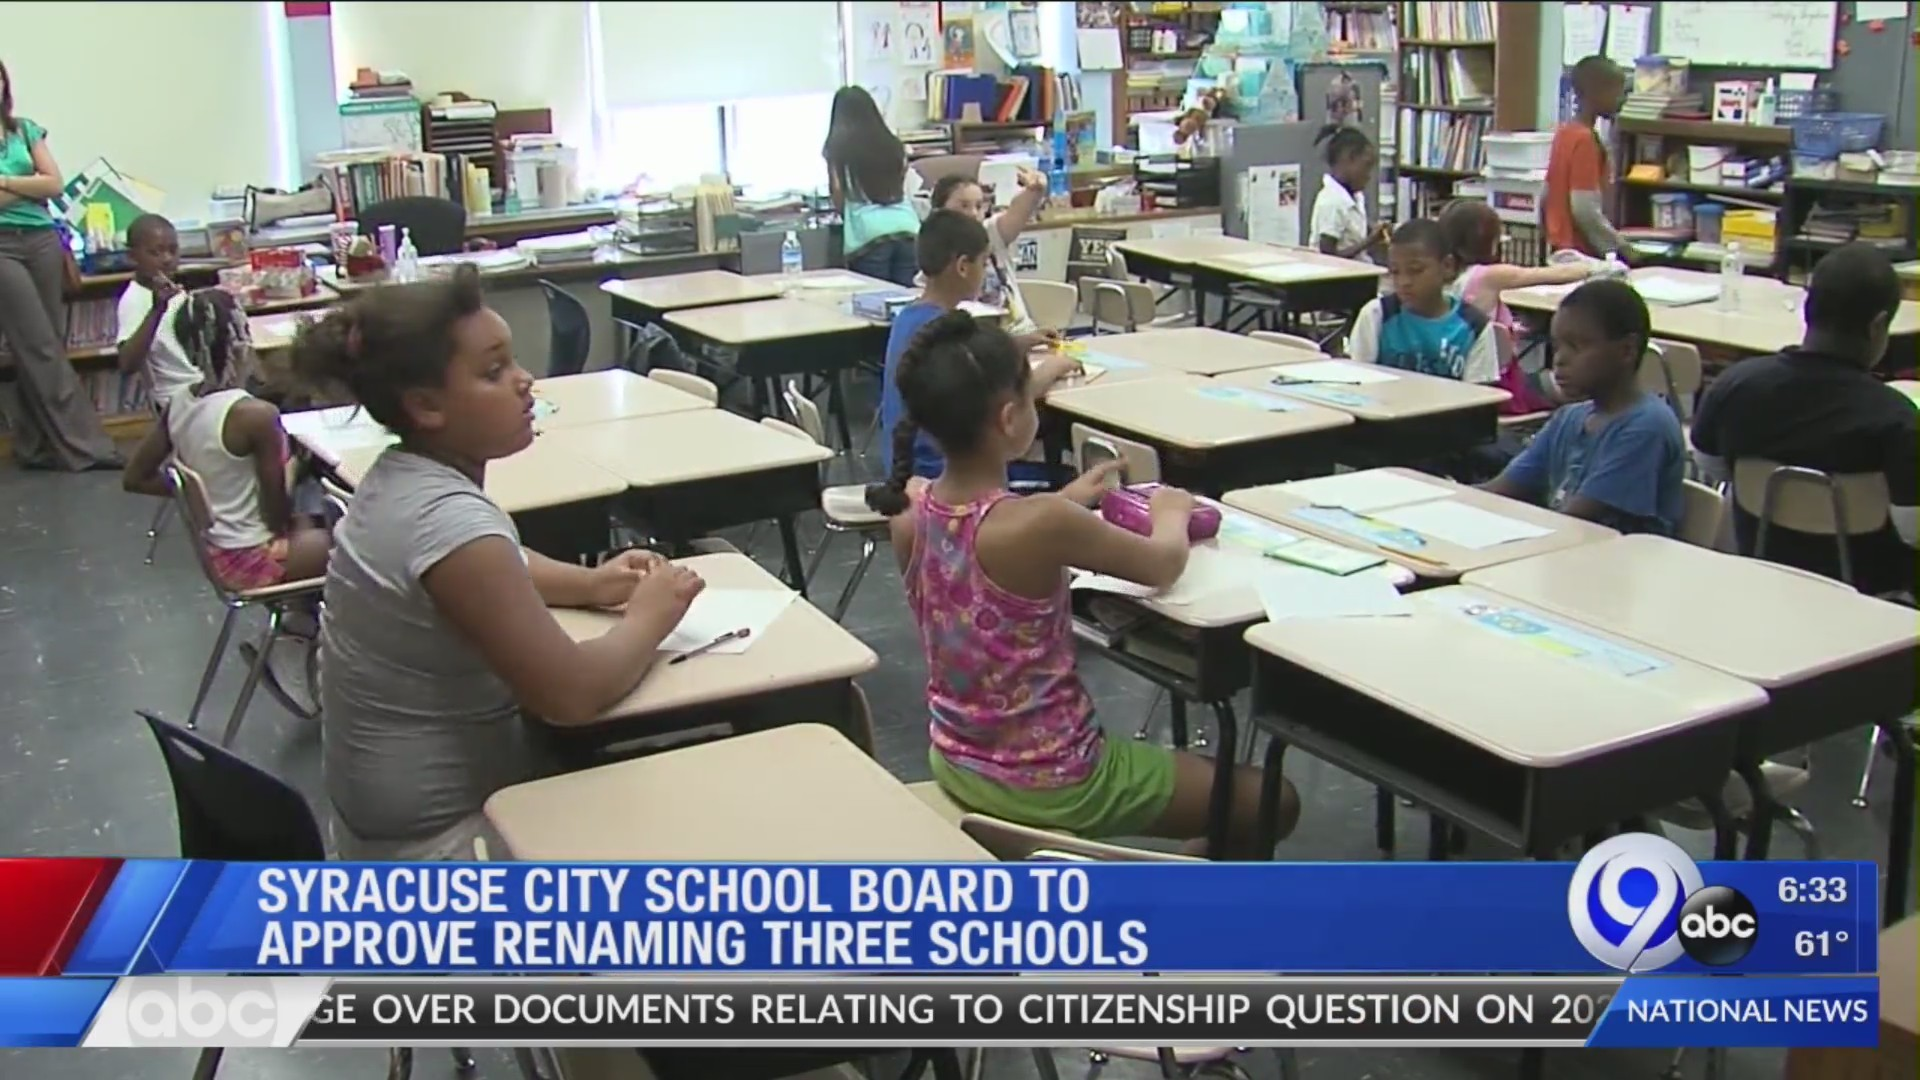 Three_Syracuse_schools_to_be_renamed_0_20190613132717